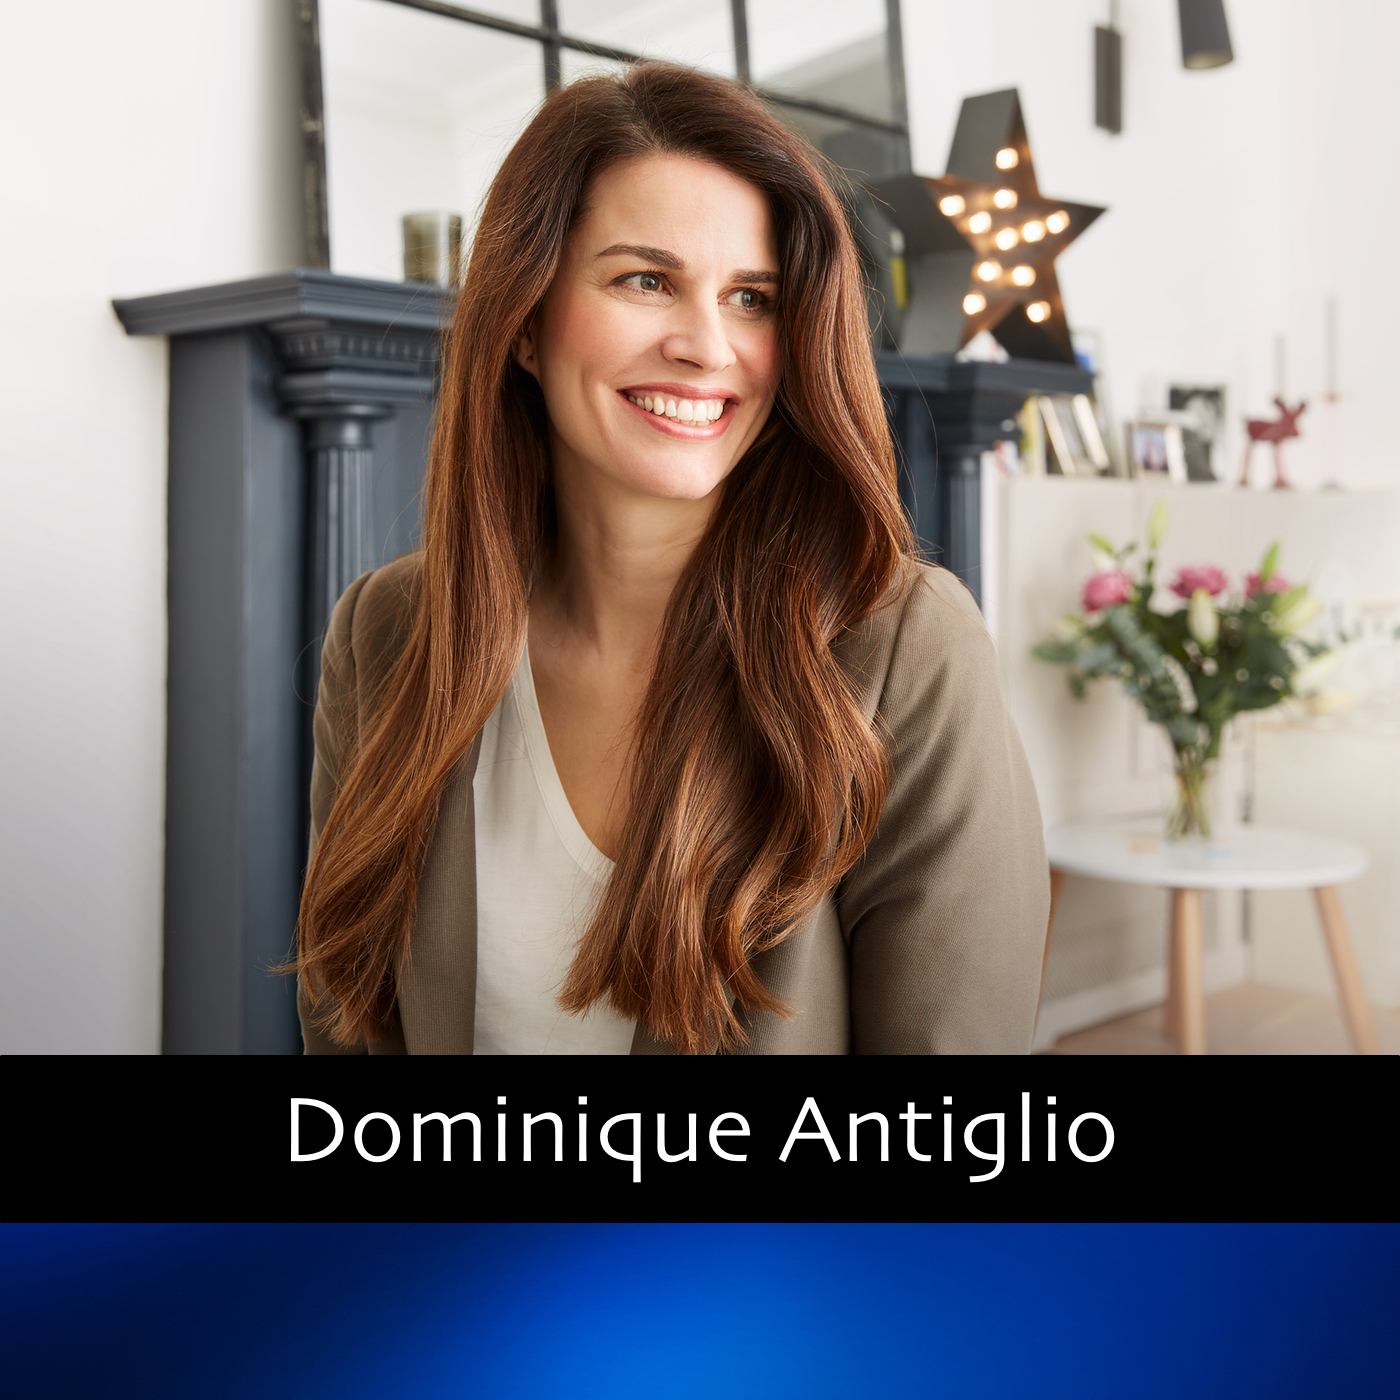 Dominique Antiglio thumb.jpg